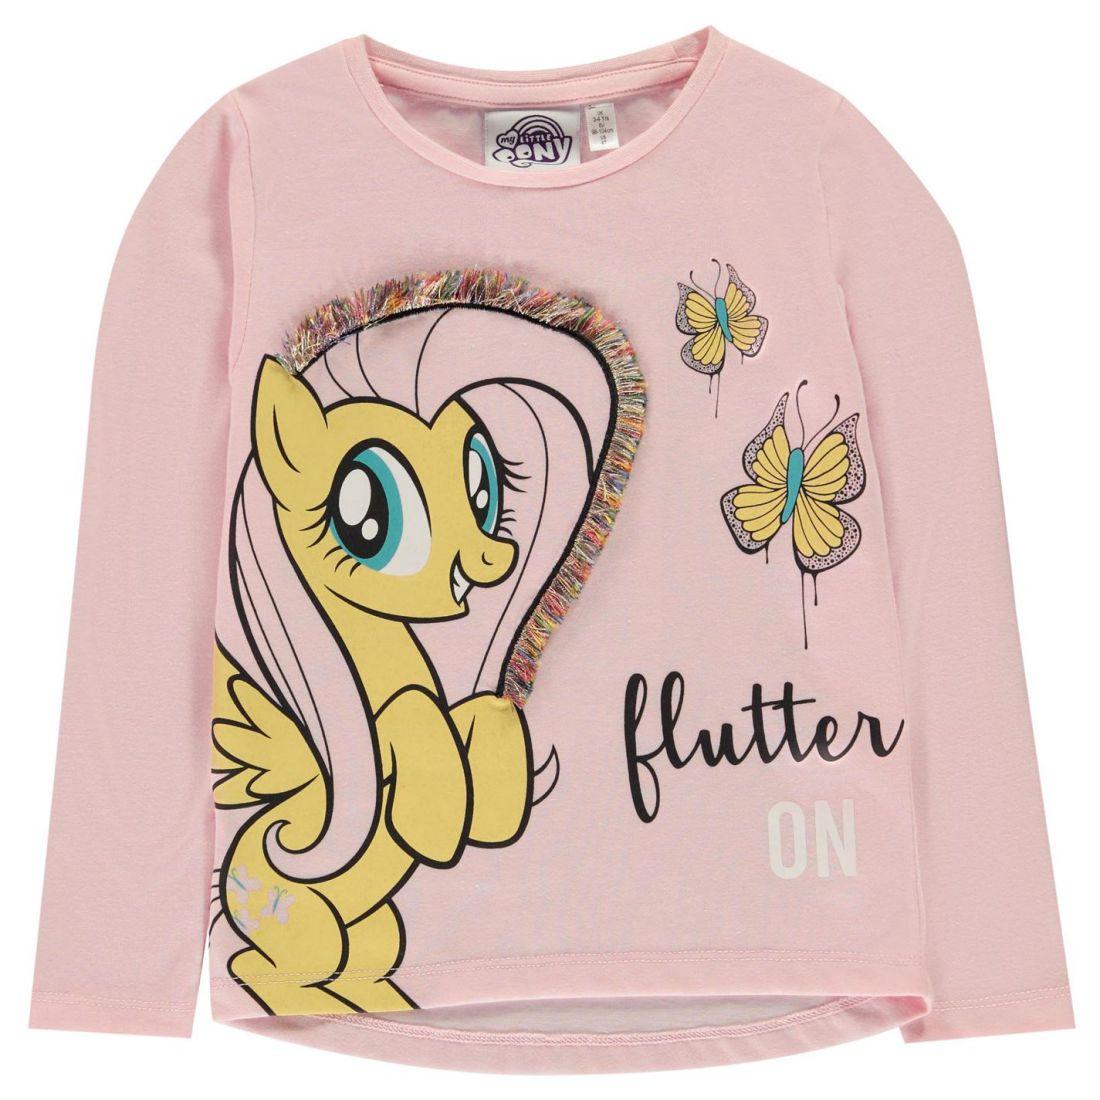 Character Kids Girls Long Sleeve Top Infant Shirt Crew Neck Print 3